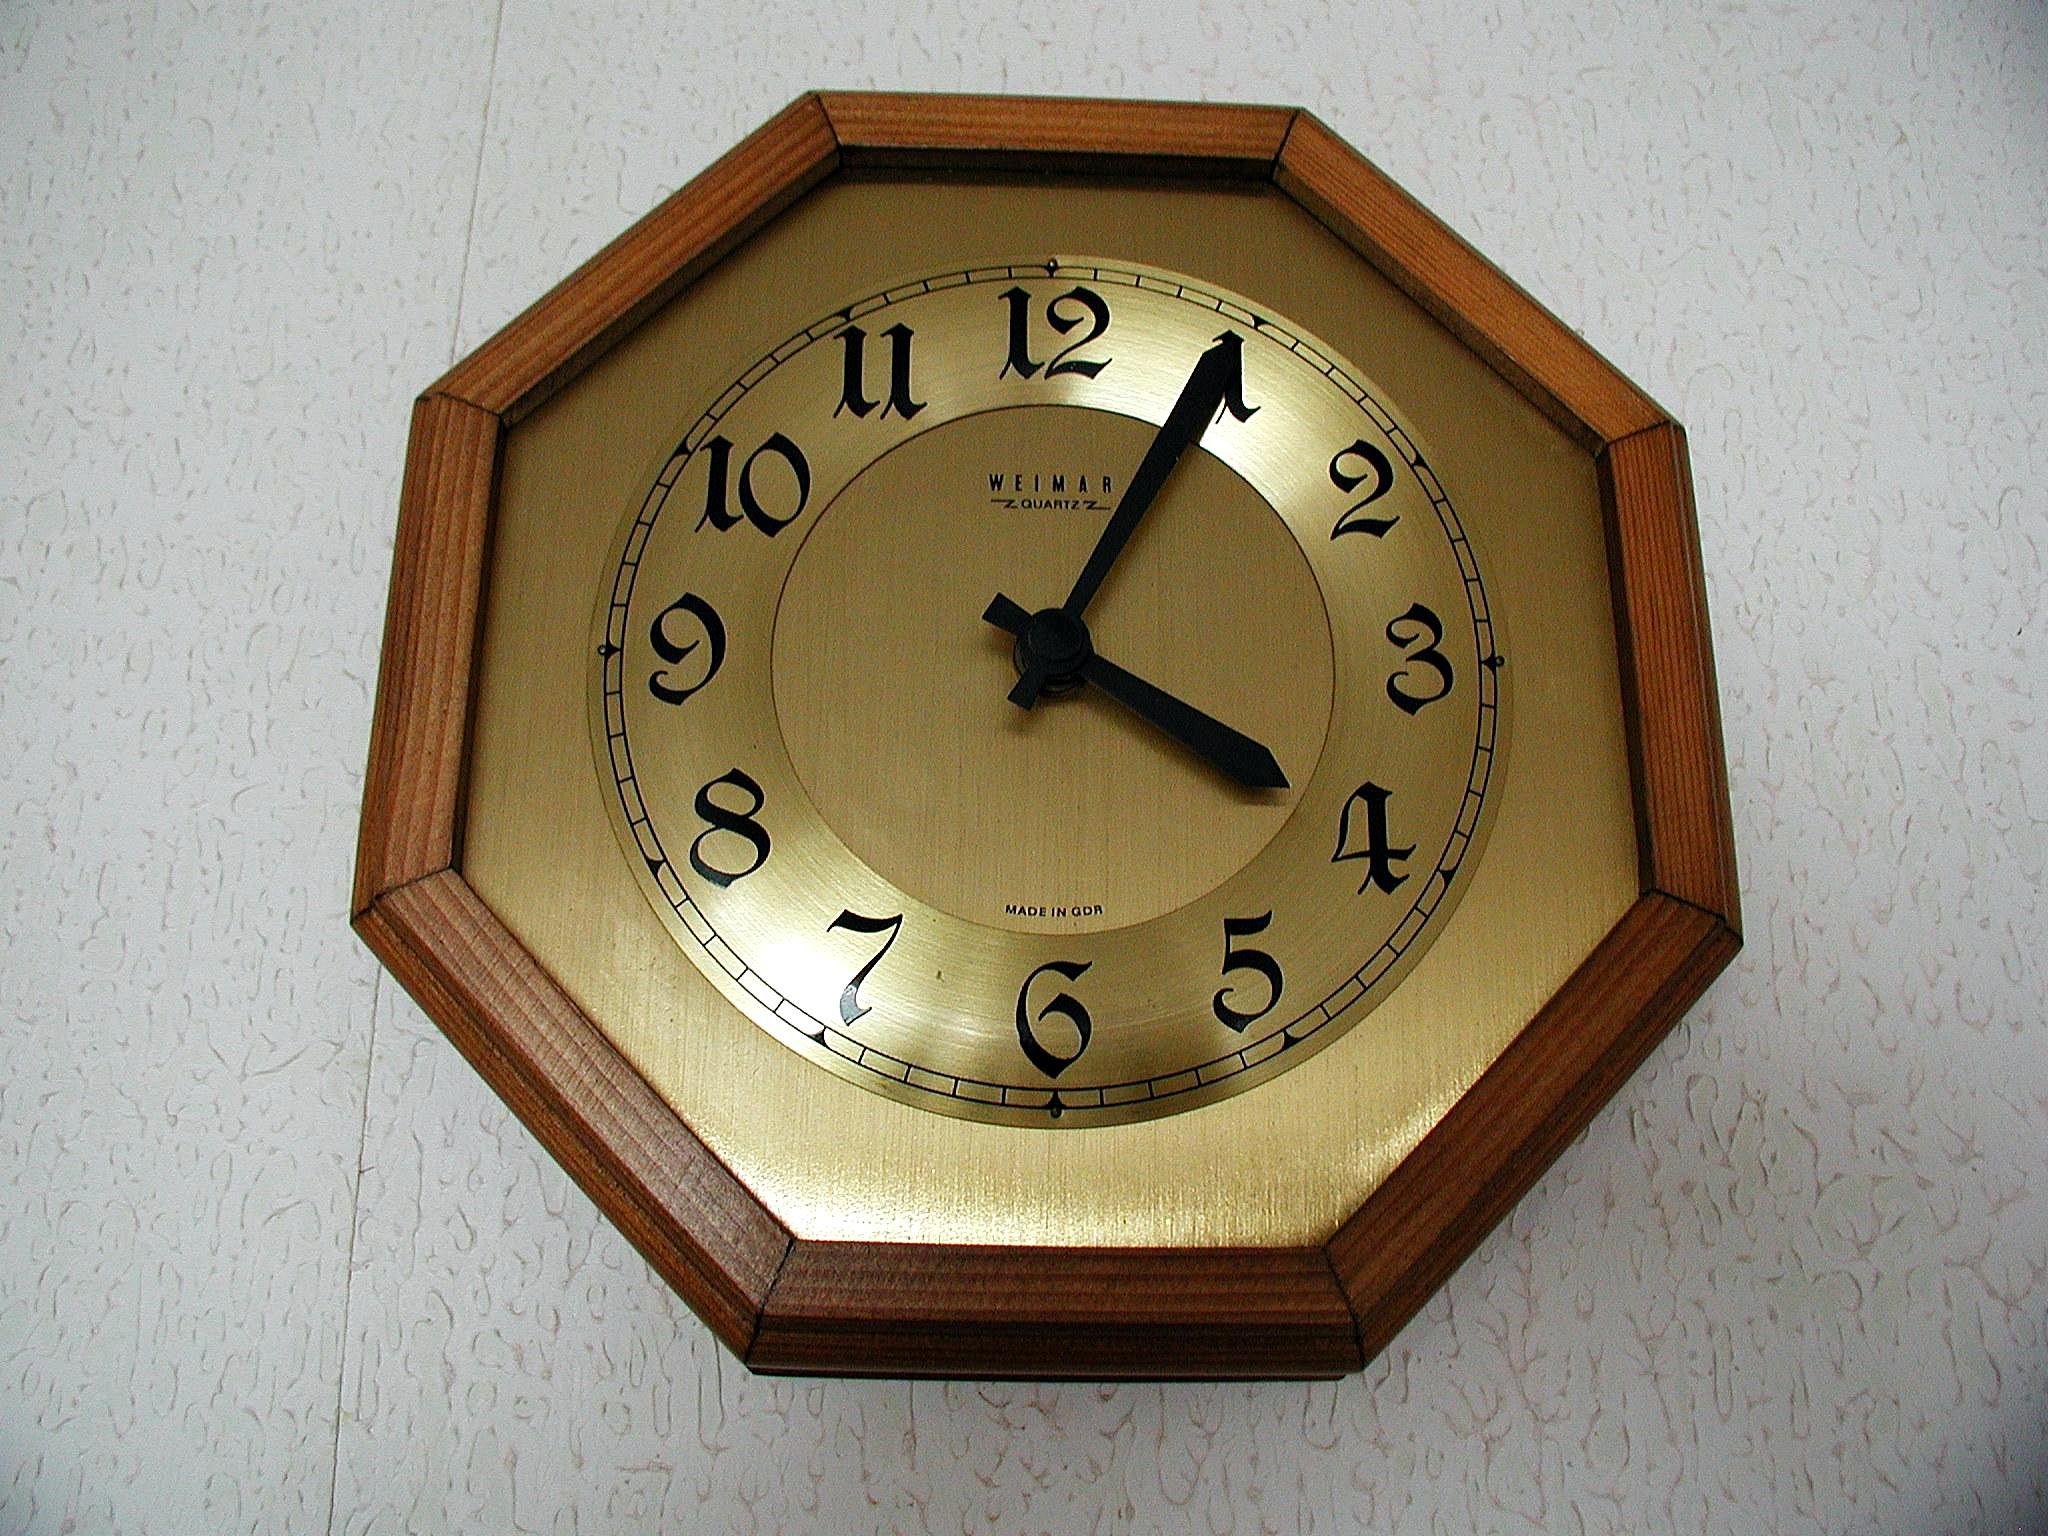 file clock analog clock jpg wikimedia commons